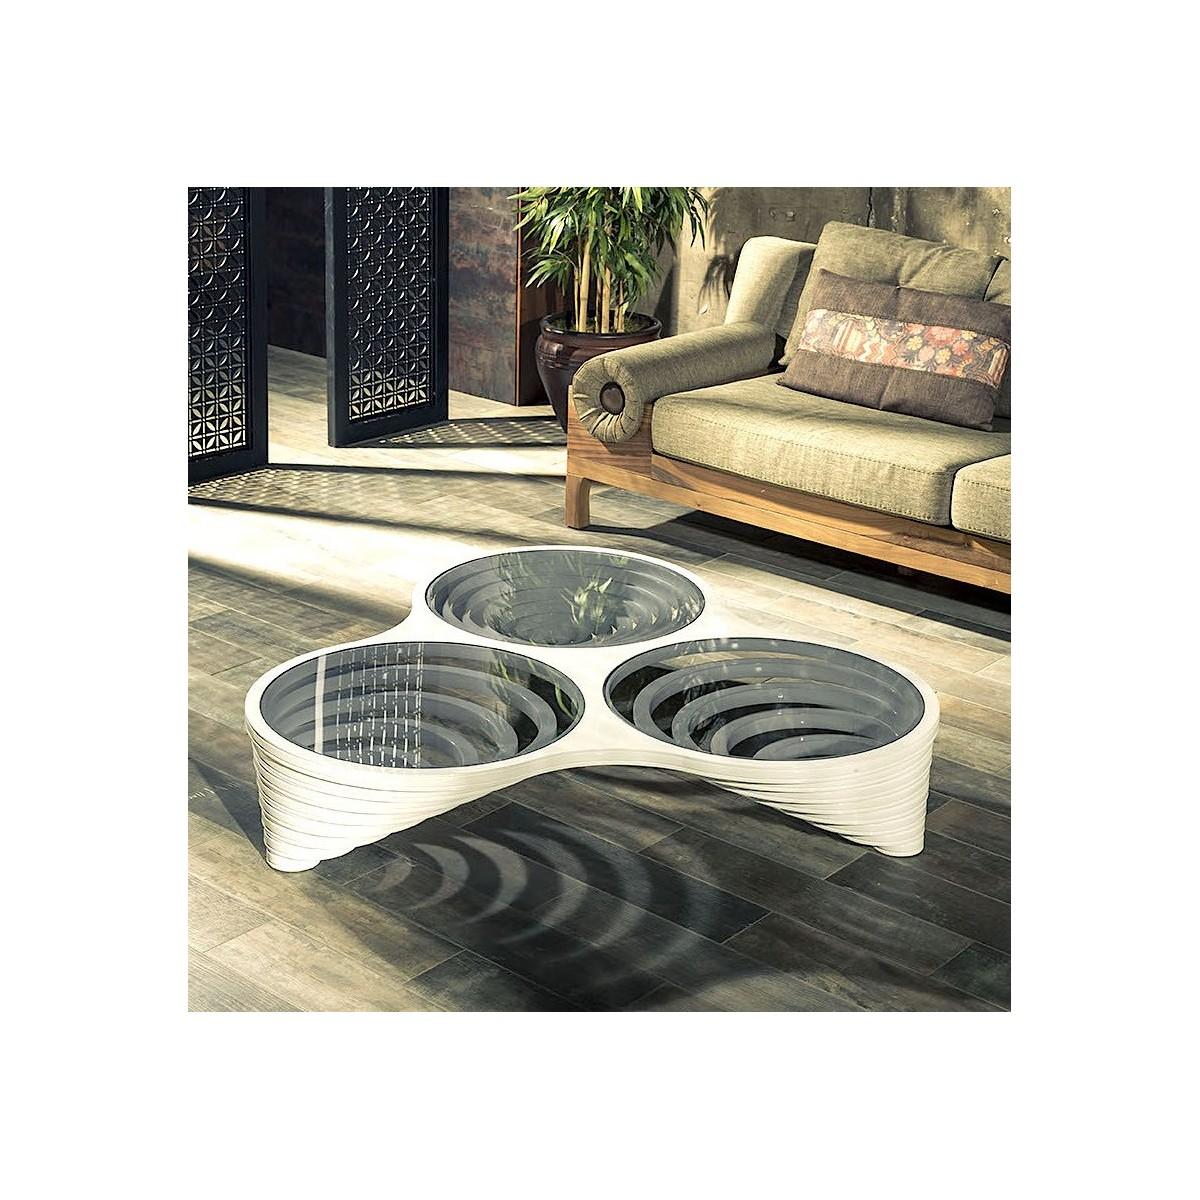 table basse paris blanc. Black Bedroom Furniture Sets. Home Design Ideas